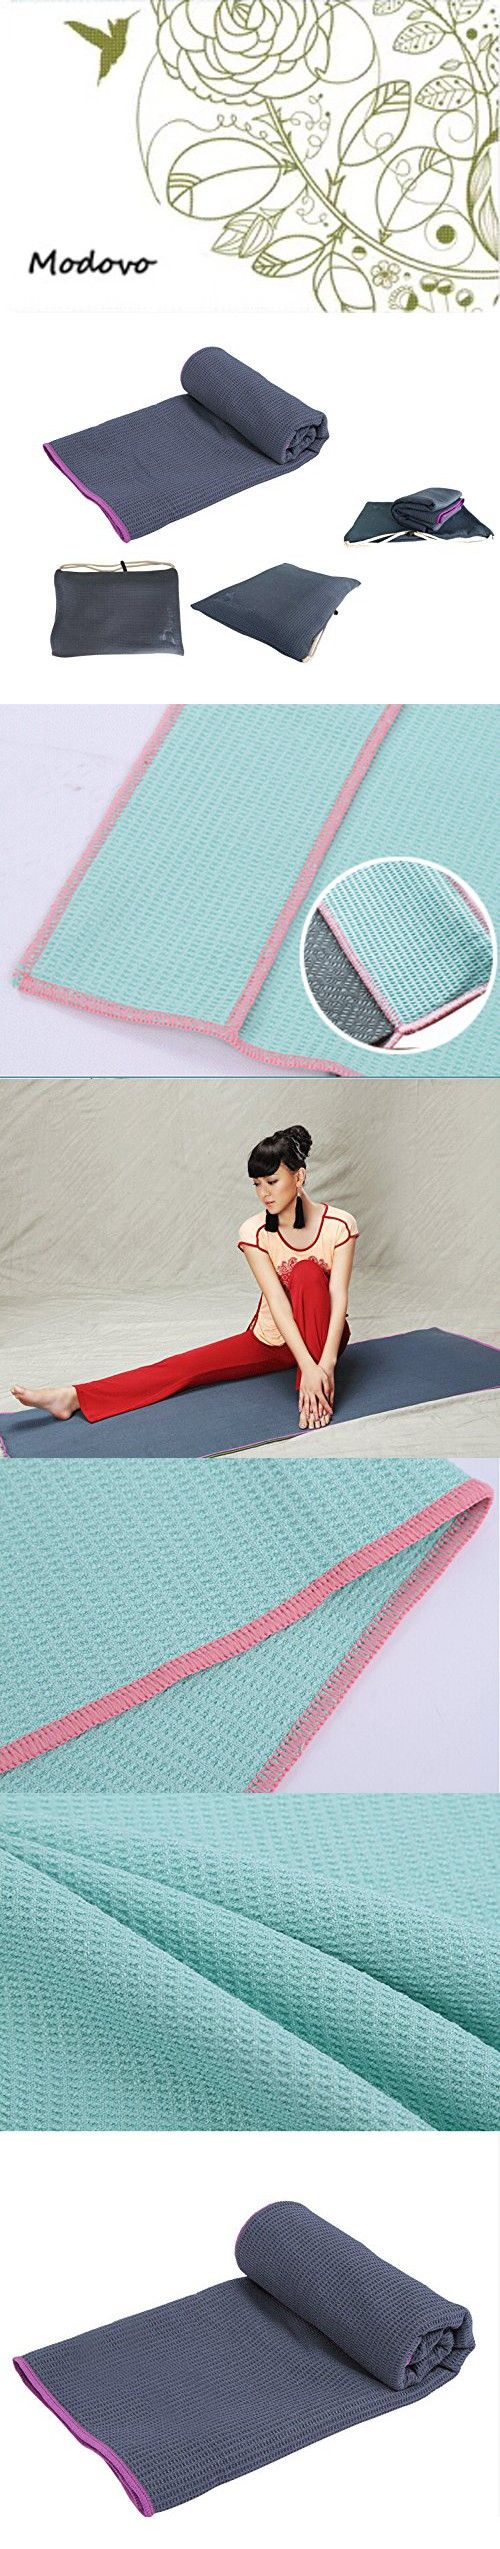 "Modovo Microfiber Non Skid Yoga Towel Dark Gray (72"" X 24"") with Carry Bag - Hot Yoga, Bikram Yoga, Vinyasa Yoga, Hatha Yoga, Ashtanga Yoga"